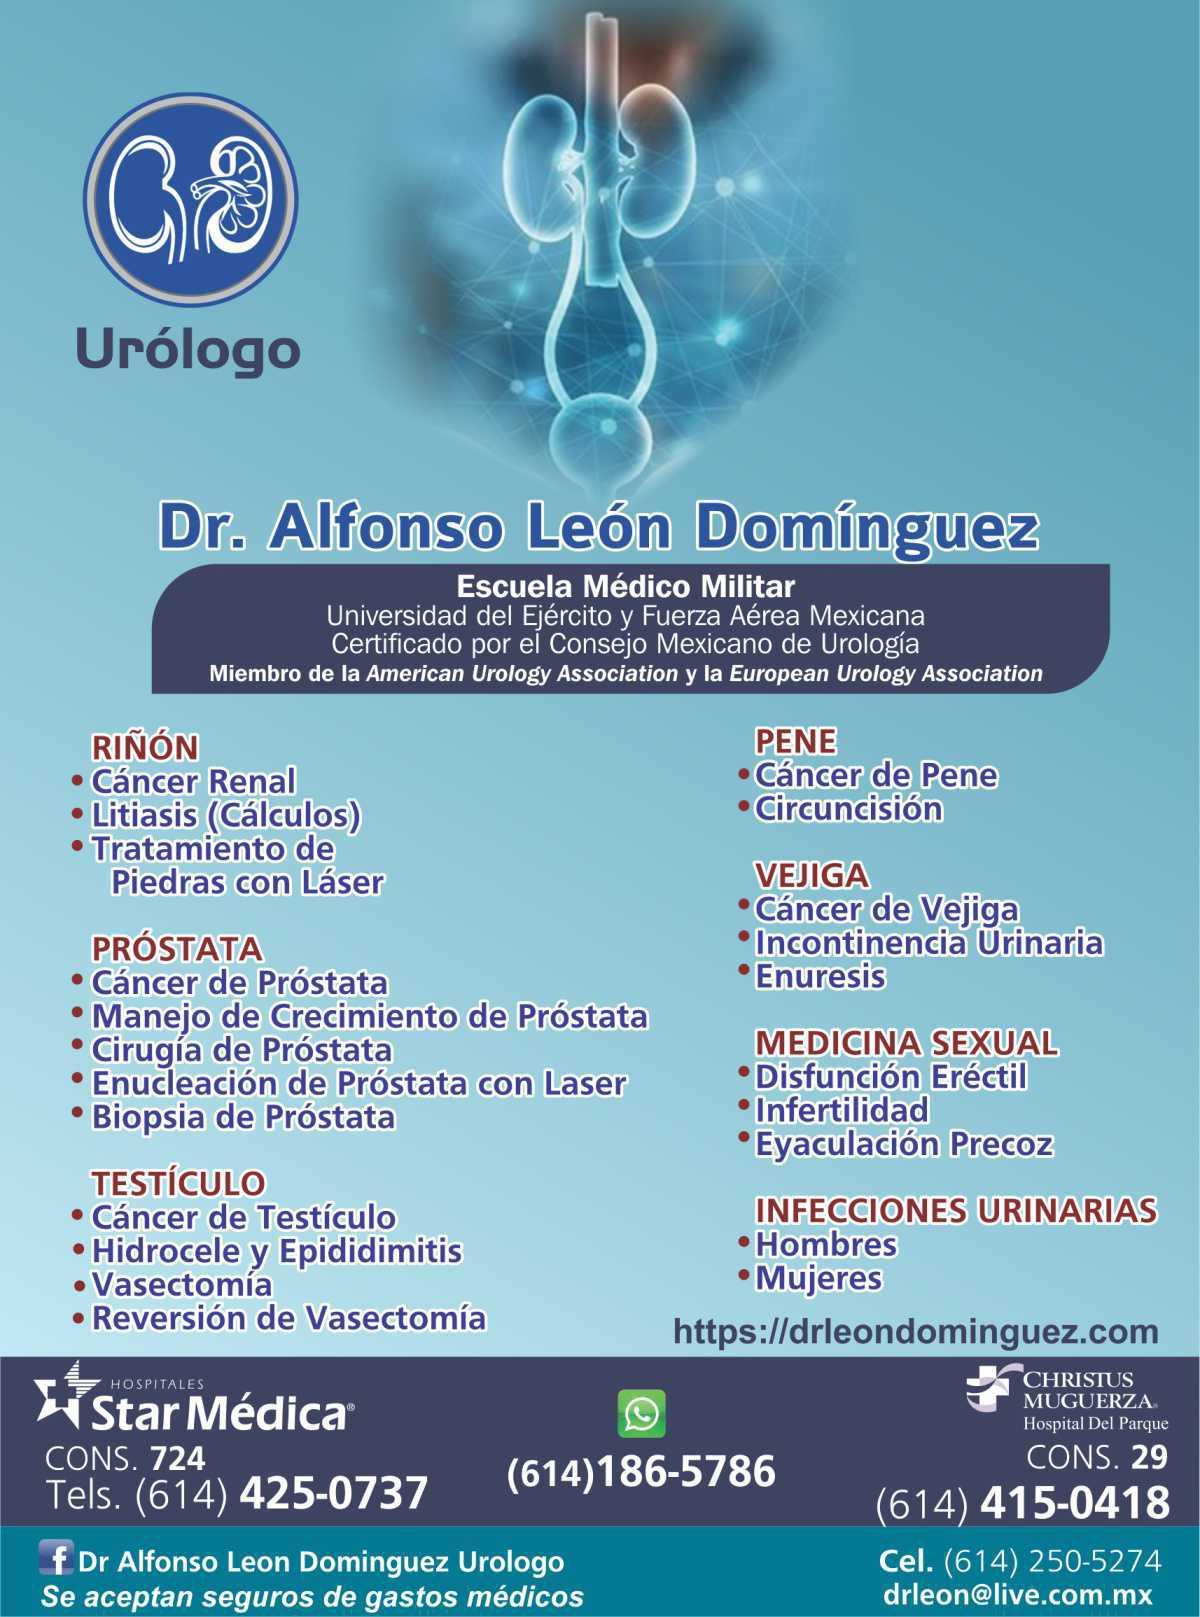 Dr. Alfonso Léon Domínguez